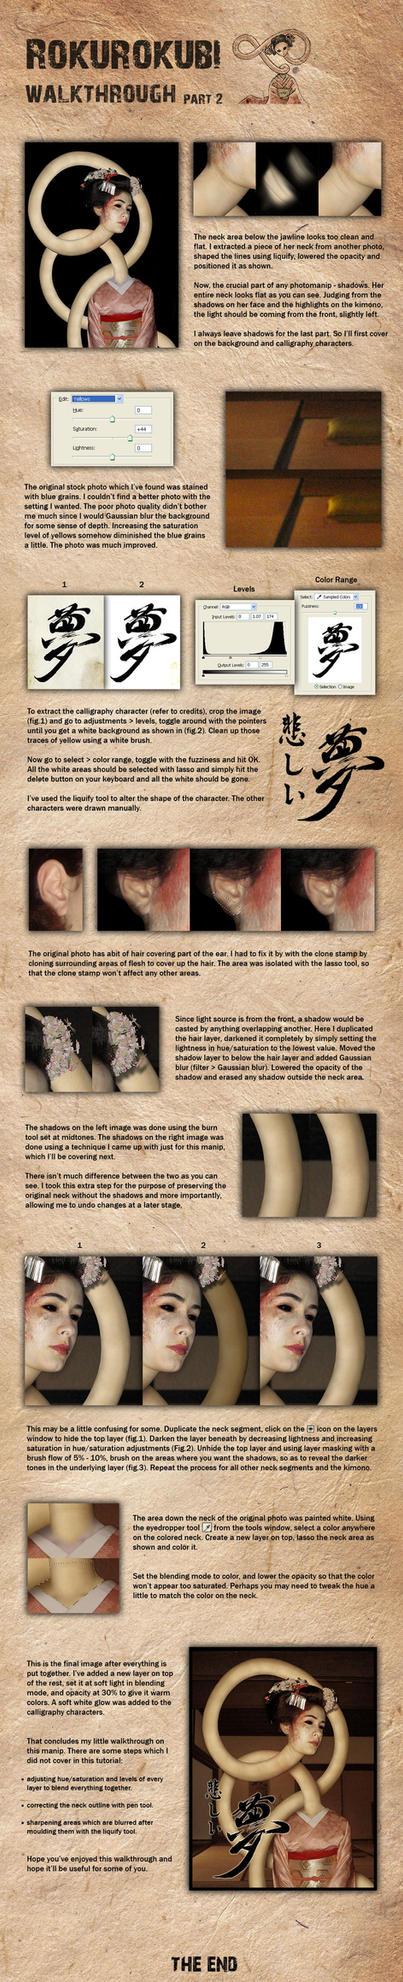 Rokurokubi Walkthrough Part 2 by ScorpionDeathlock